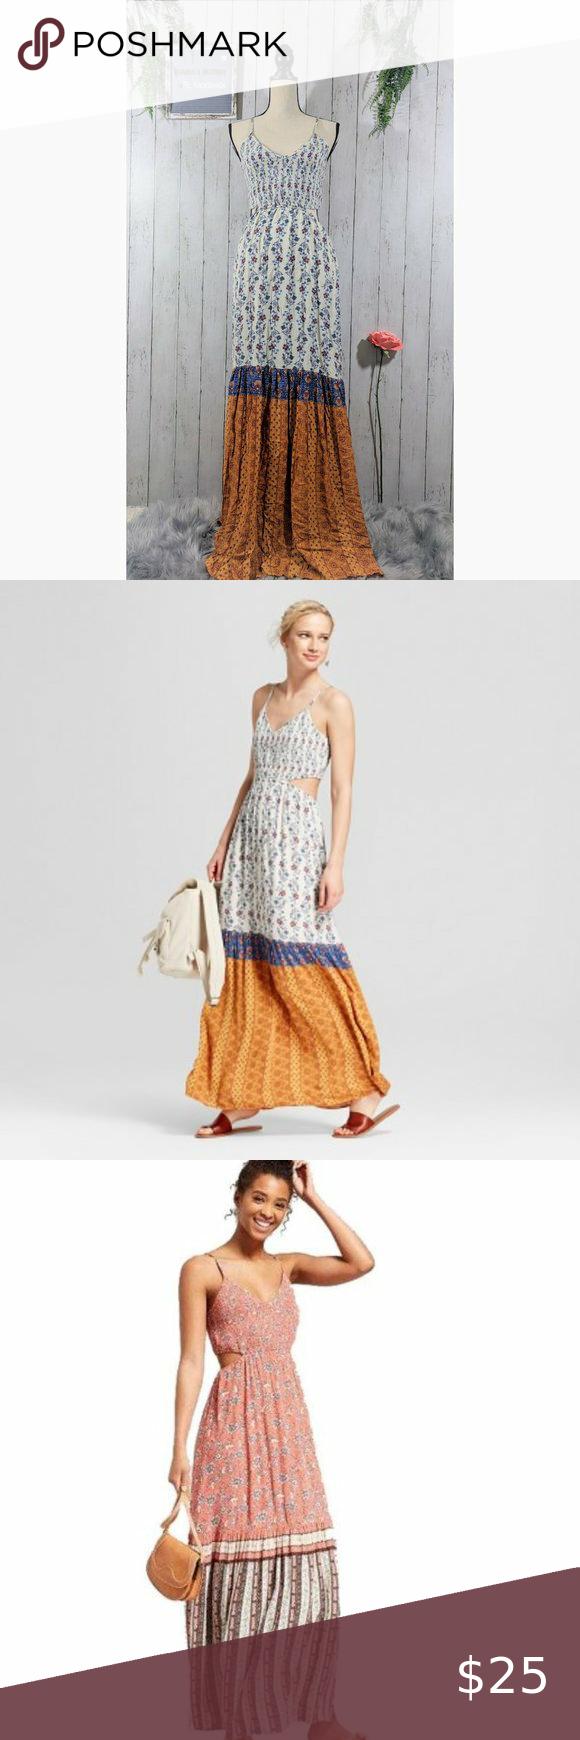 Xhilaration Maxi Dress Floral White Yellow Pink Floral Maxi Dress Boho Chic Spring Maxi Dress [ 1740 x 580 Pixel ]